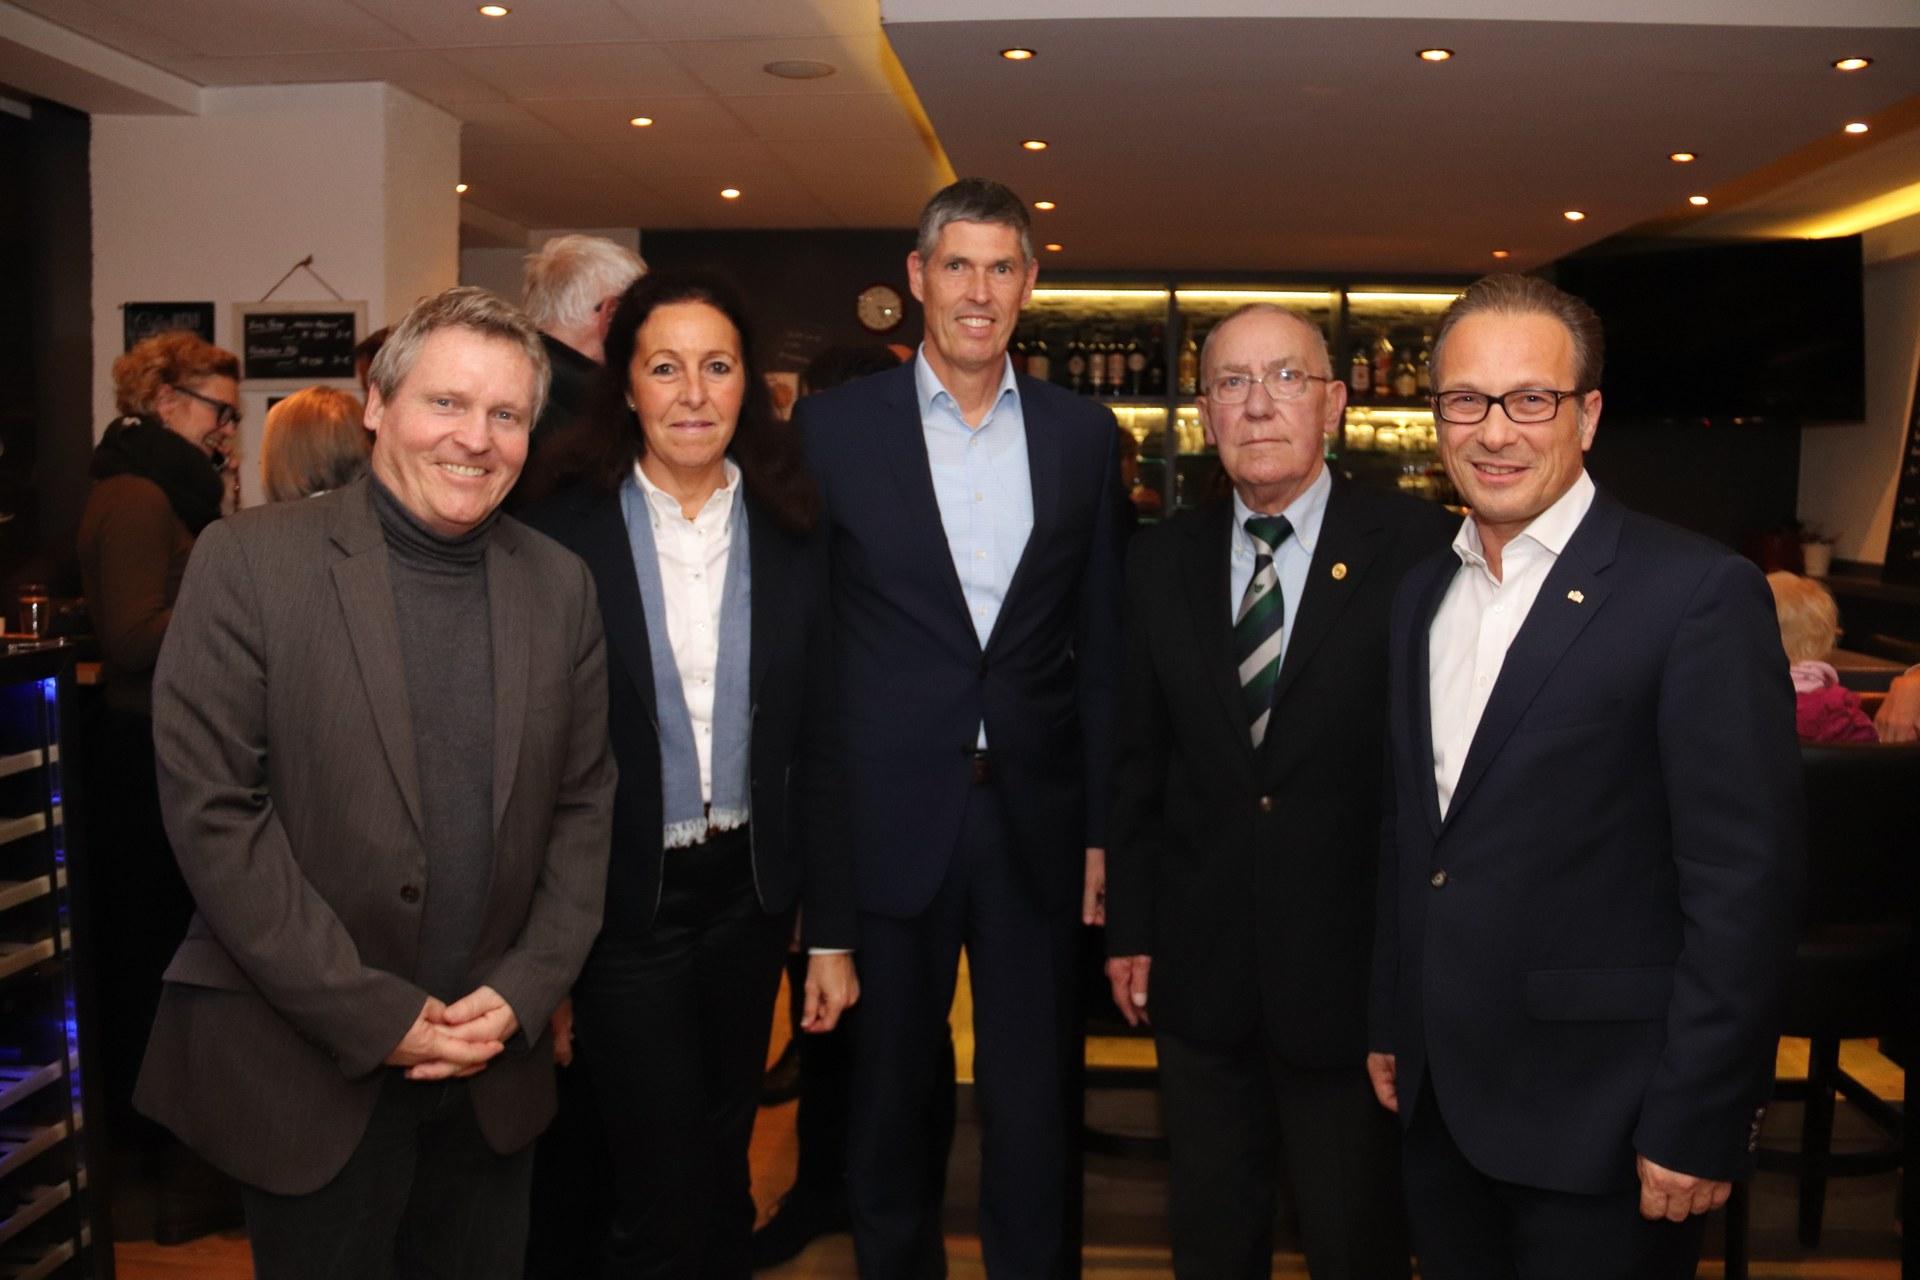 Detlef Berthold, Sibylle Wallossek, Andreas Schwarz, Walter Lonnes, Reiner Breuer.JPG